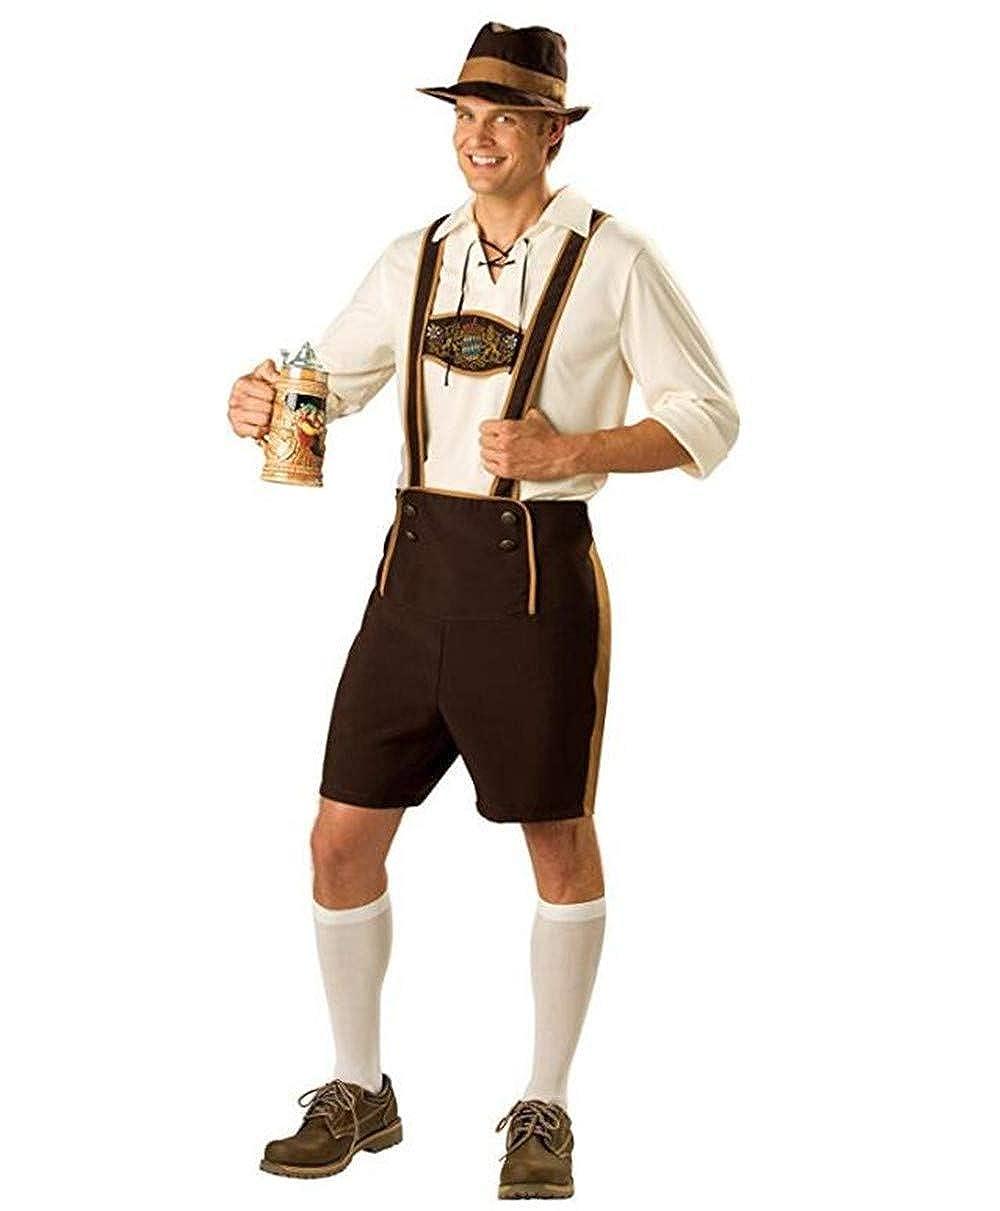 Halloween The Munich Oktoberfest Costume Beer Festival Man Adult Fancy Dress Polyester